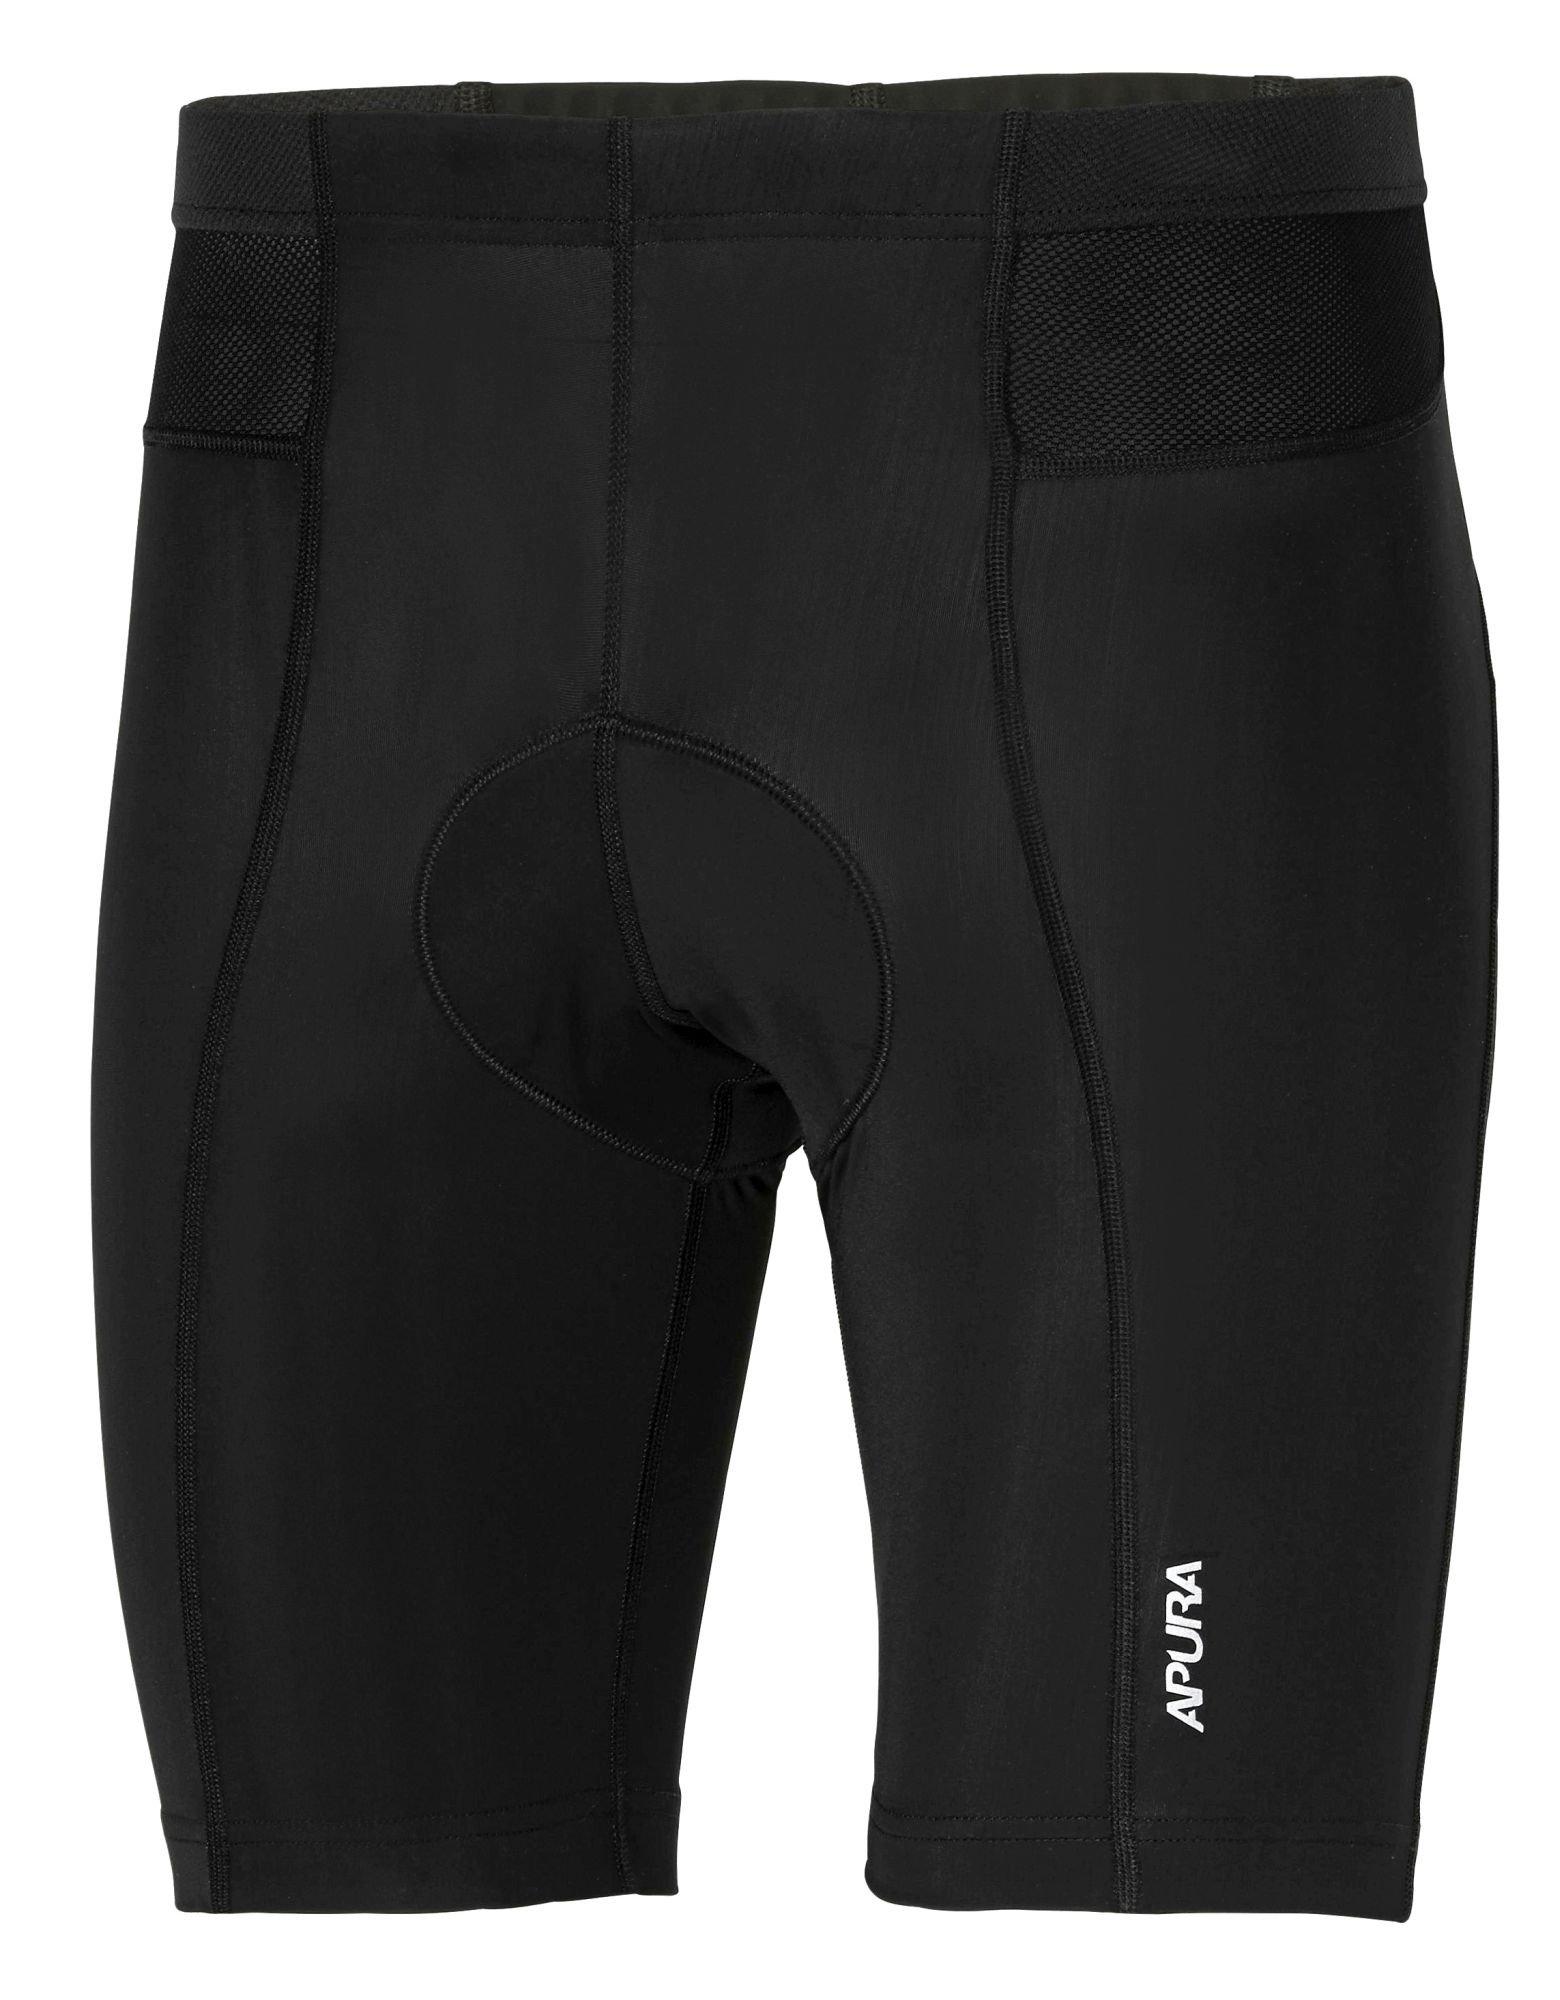 Apura Herren Shorts Basic Shorts 2.0